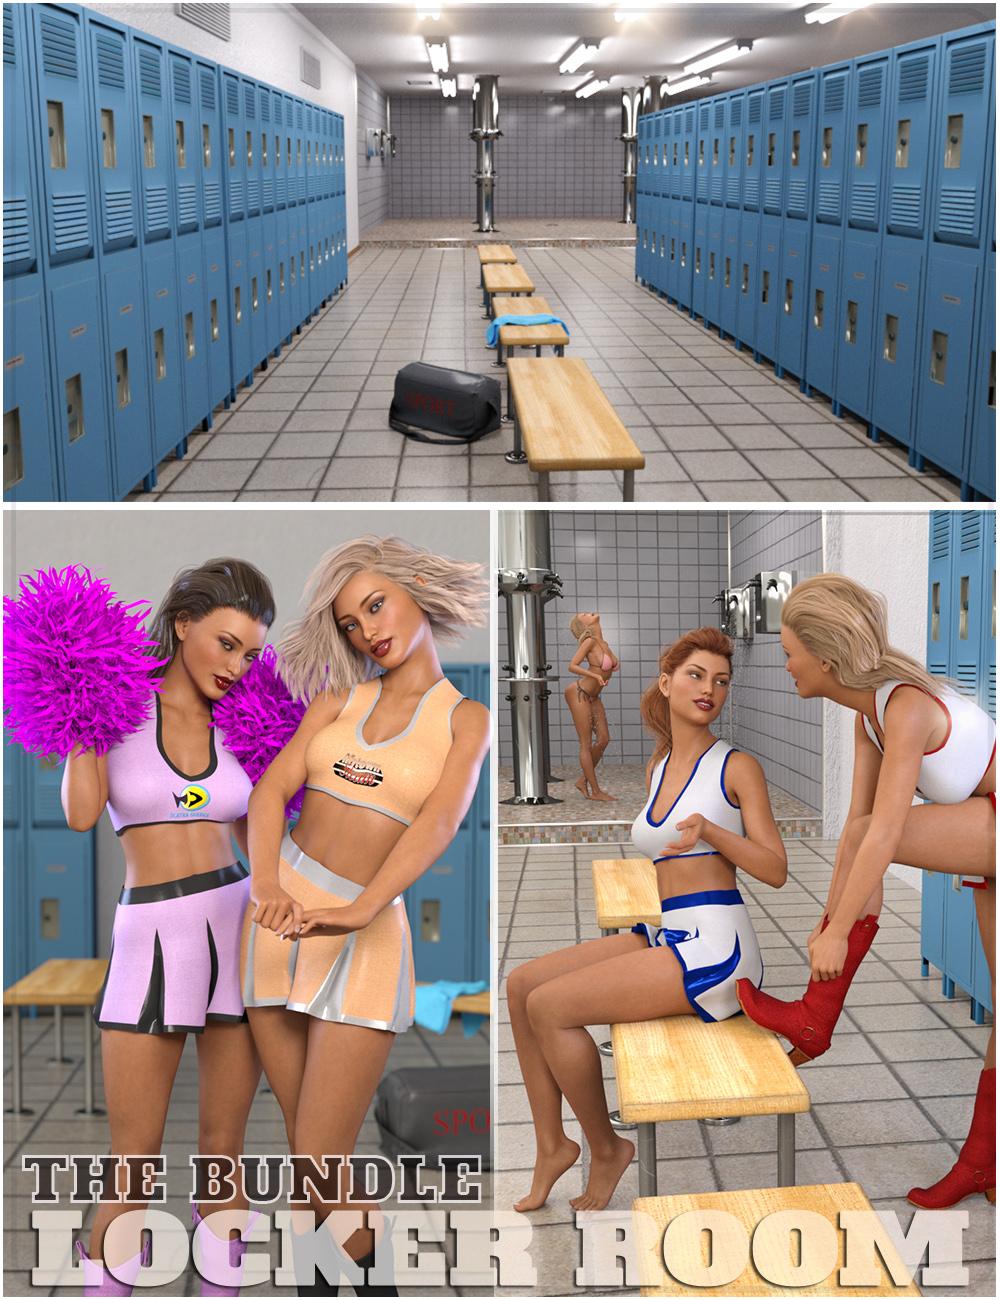 Locker Room Bundle by: ZeddicussFugazi1968, 3D Models by Daz 3D